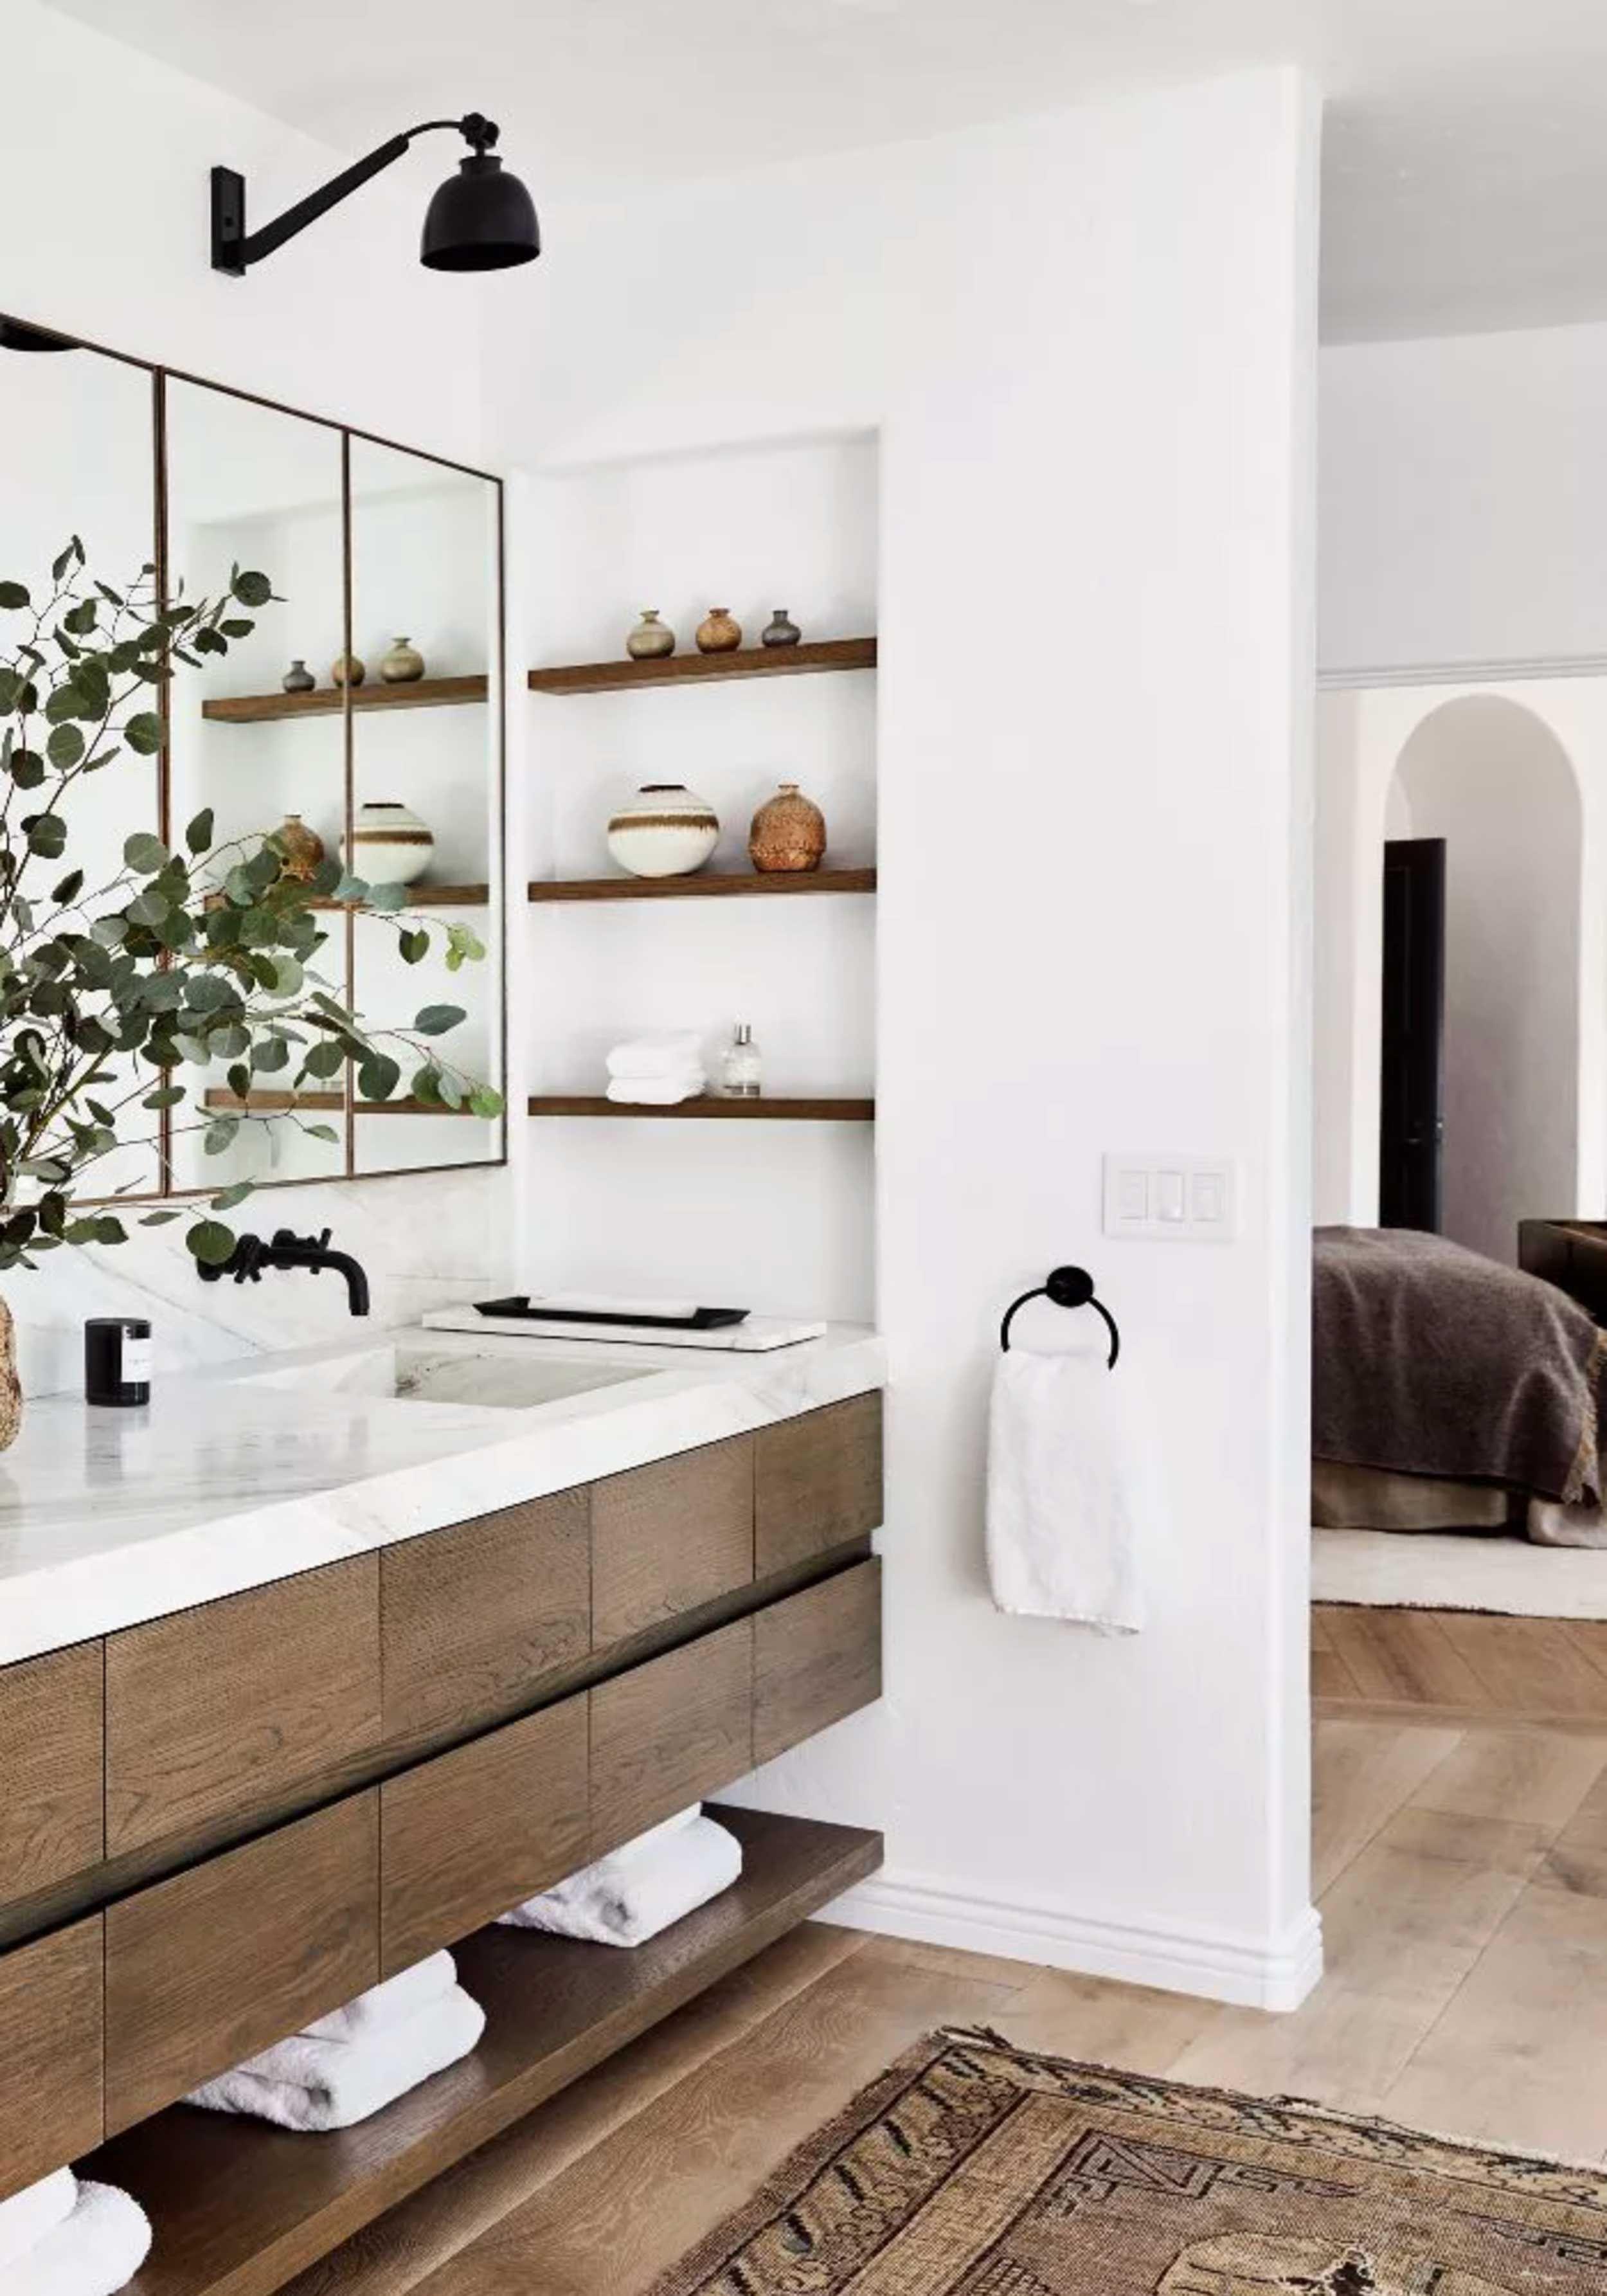 Creative Diy Storage Ideas To Organize Your Bathroom In 2020 Bathroom Interior Design Bathroom Interior Home